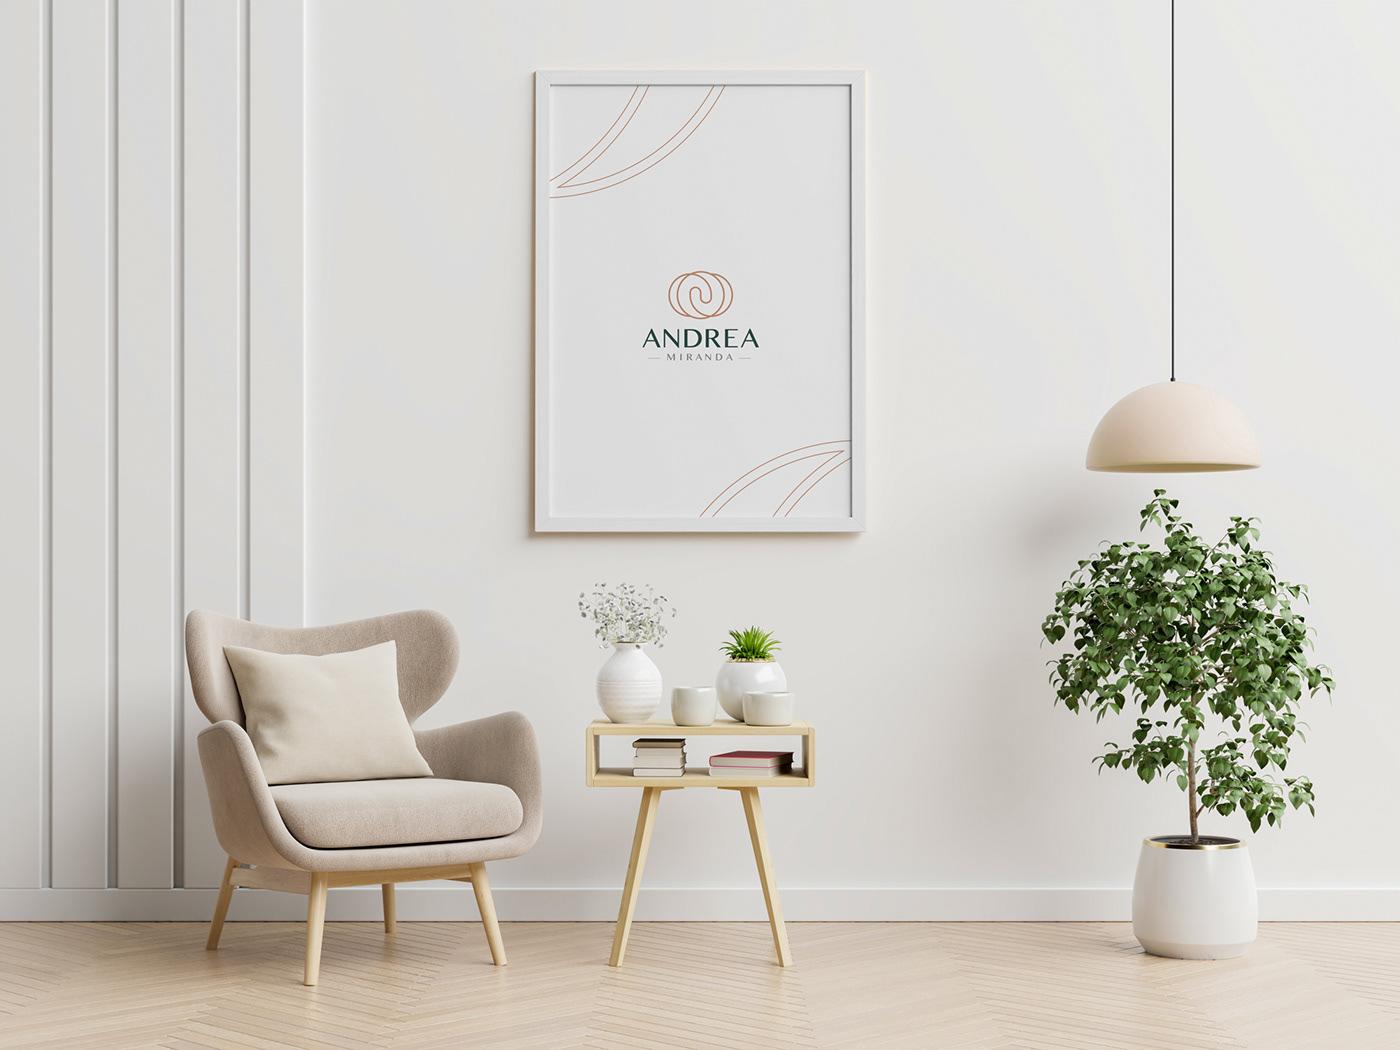 cura feminino homeopatia identidade de marca identidade visual logo Logotipo medicina antroposófica Nature